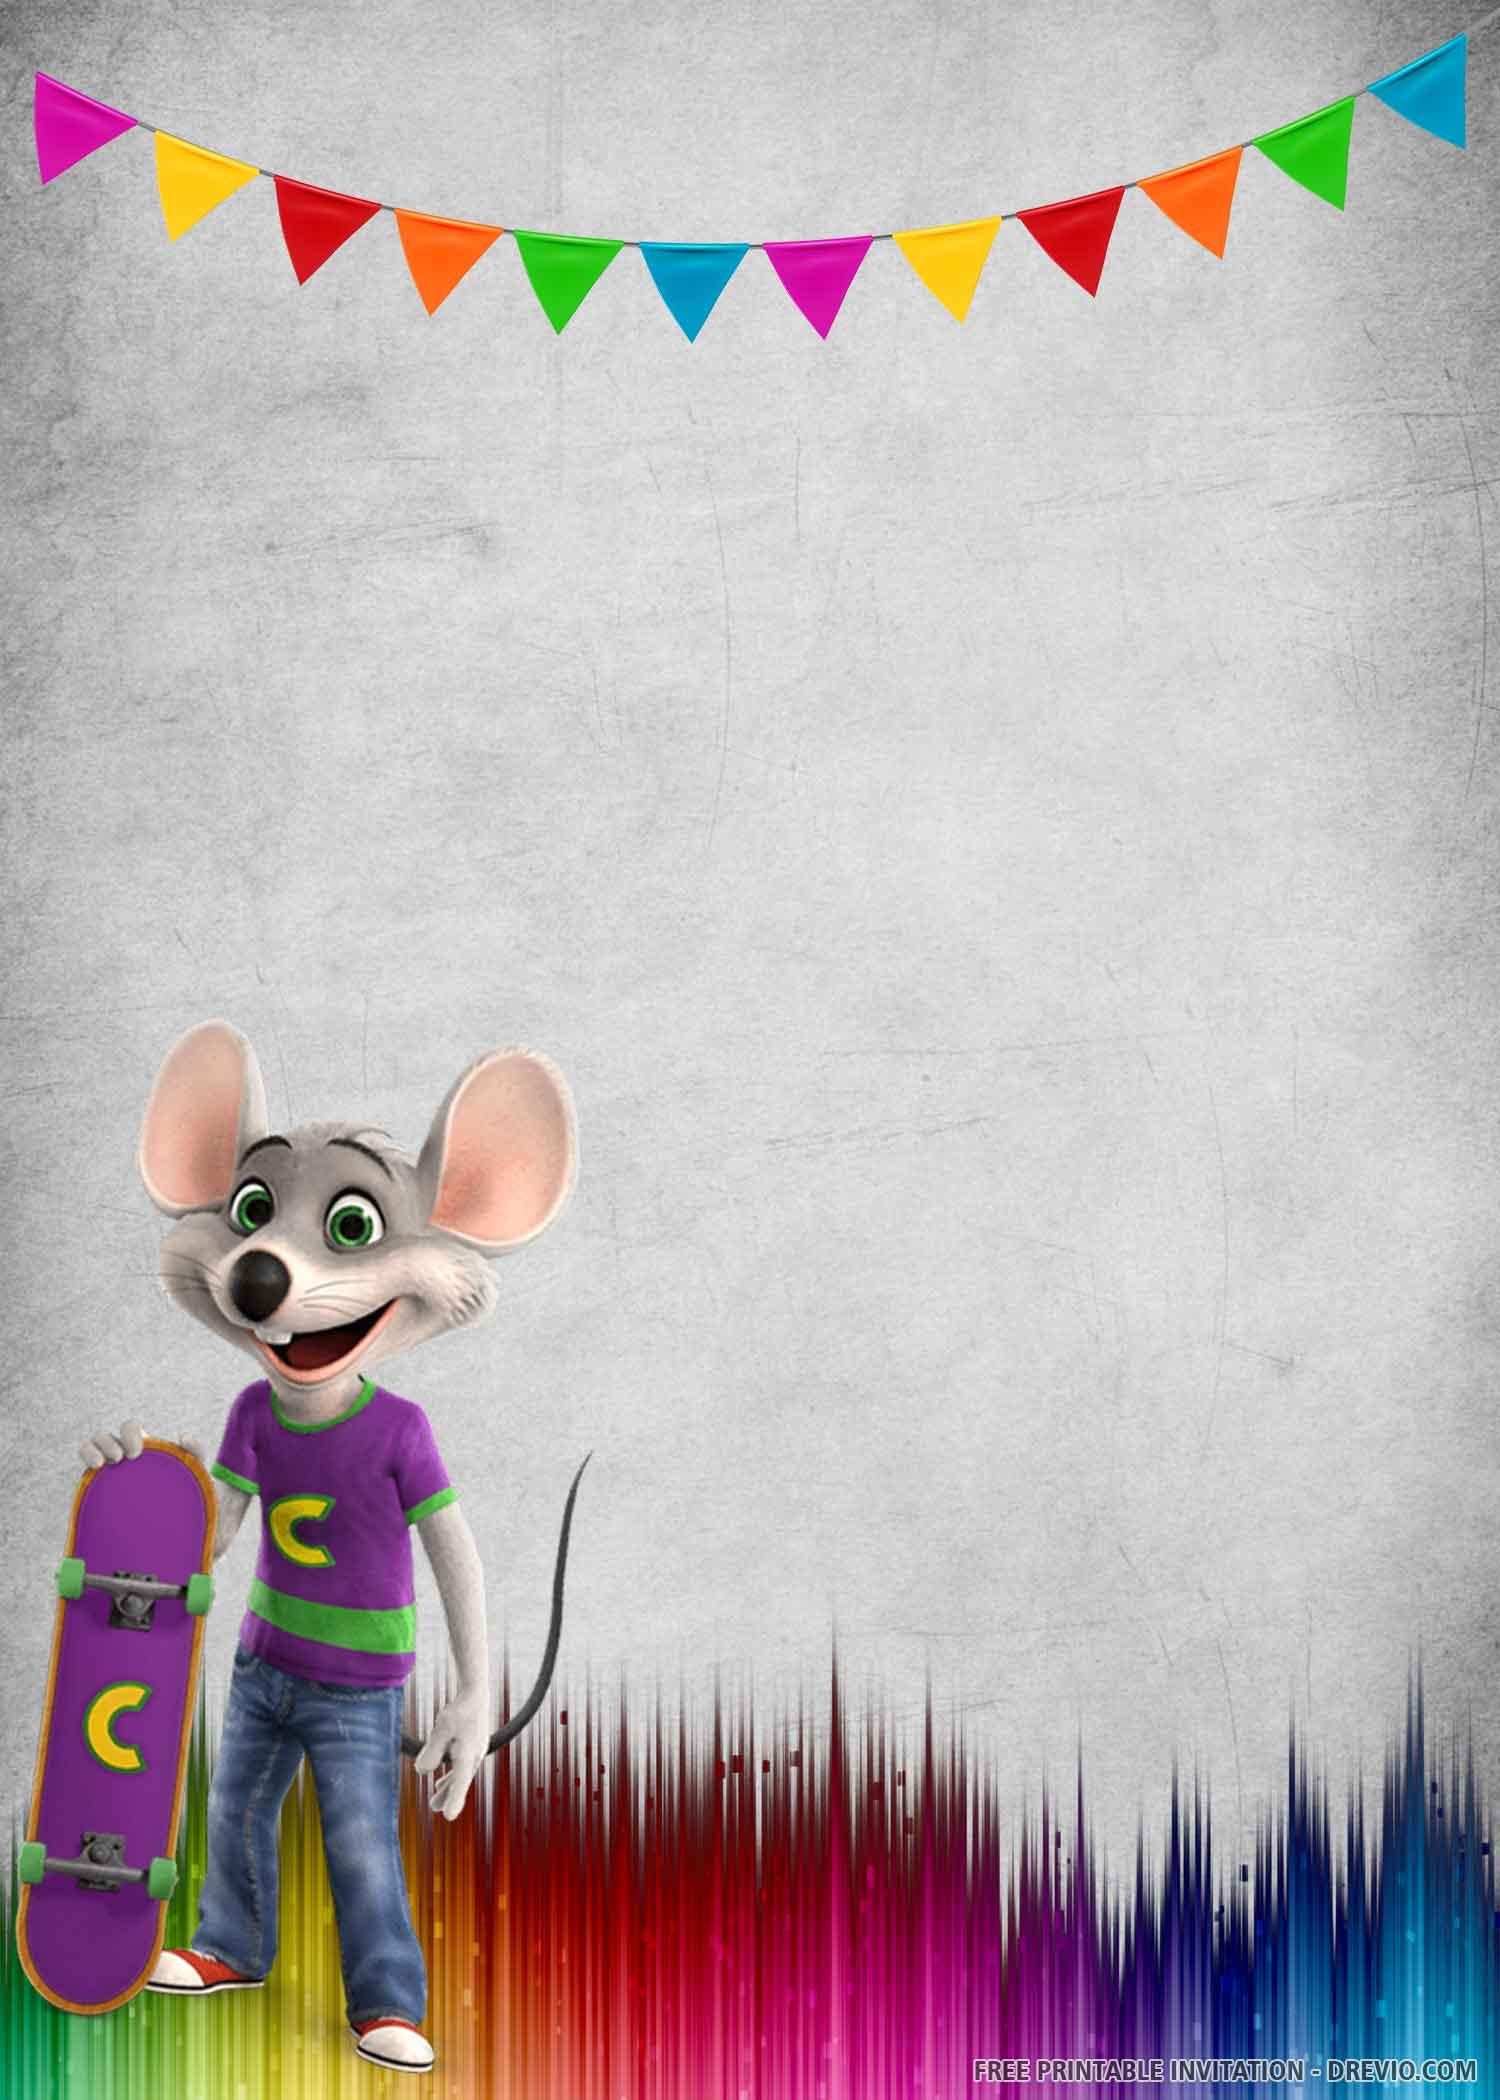 Free Printable Chuck E Cheese Birthday Invitation Template Download Hundreds Free Printable Birthday Invitation Templates